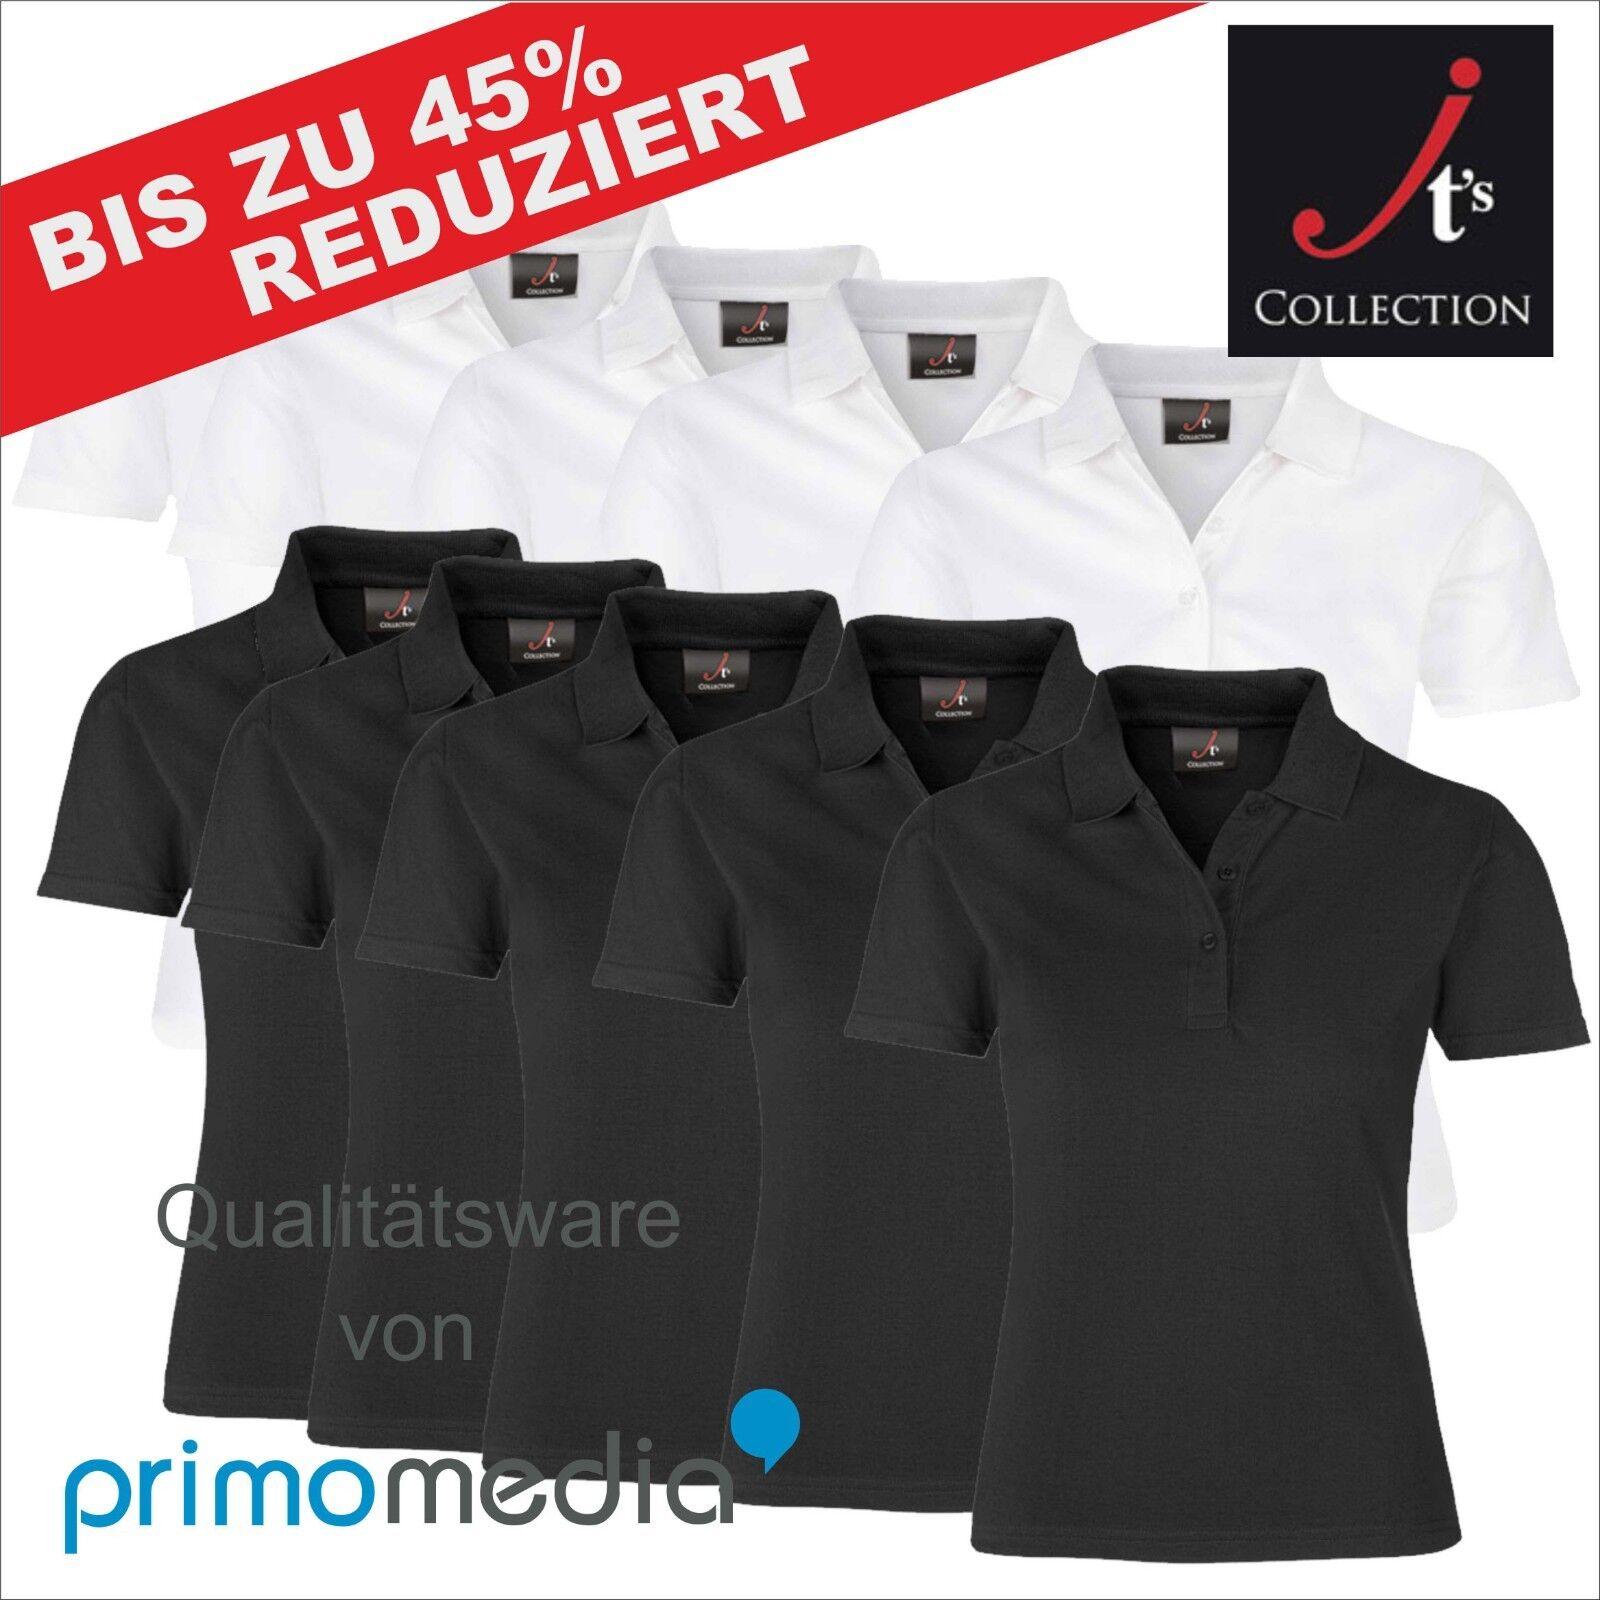 10er Paket Poloshirts Damen Sparpaket Elegant Div. Farben Bedruckbar Sporttop